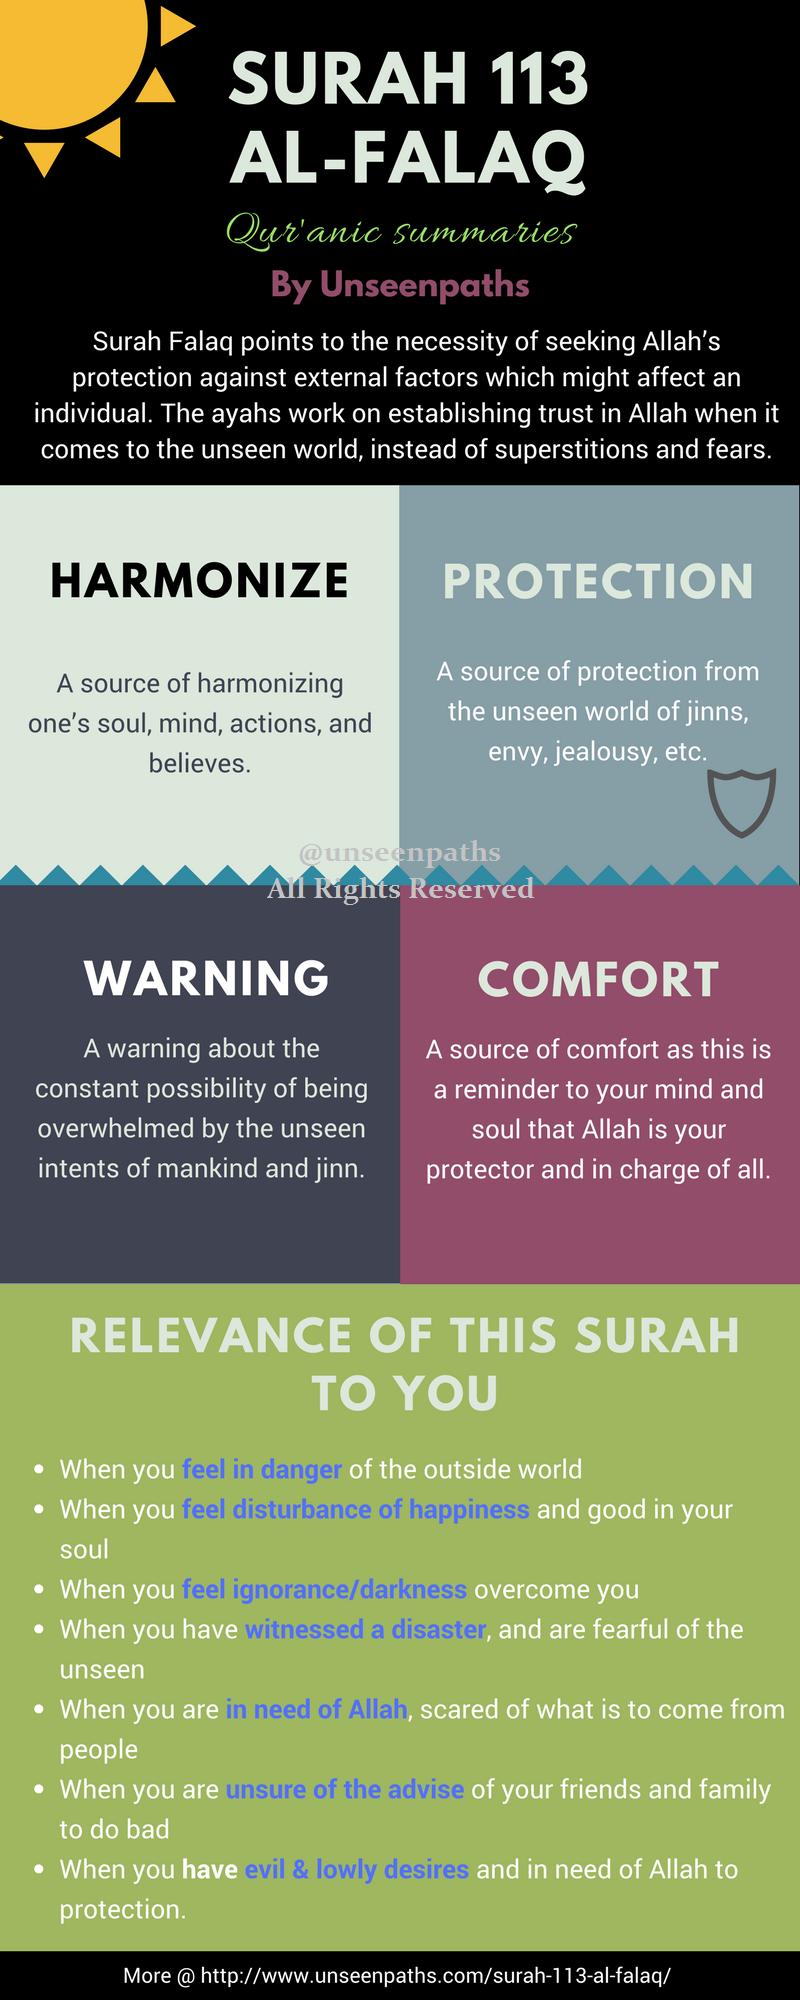 Manfaat Surat Al Falaq : manfaat, surat, falaq, Al-Quranul, Karim, Ideas, Quran,, Learn, Islam